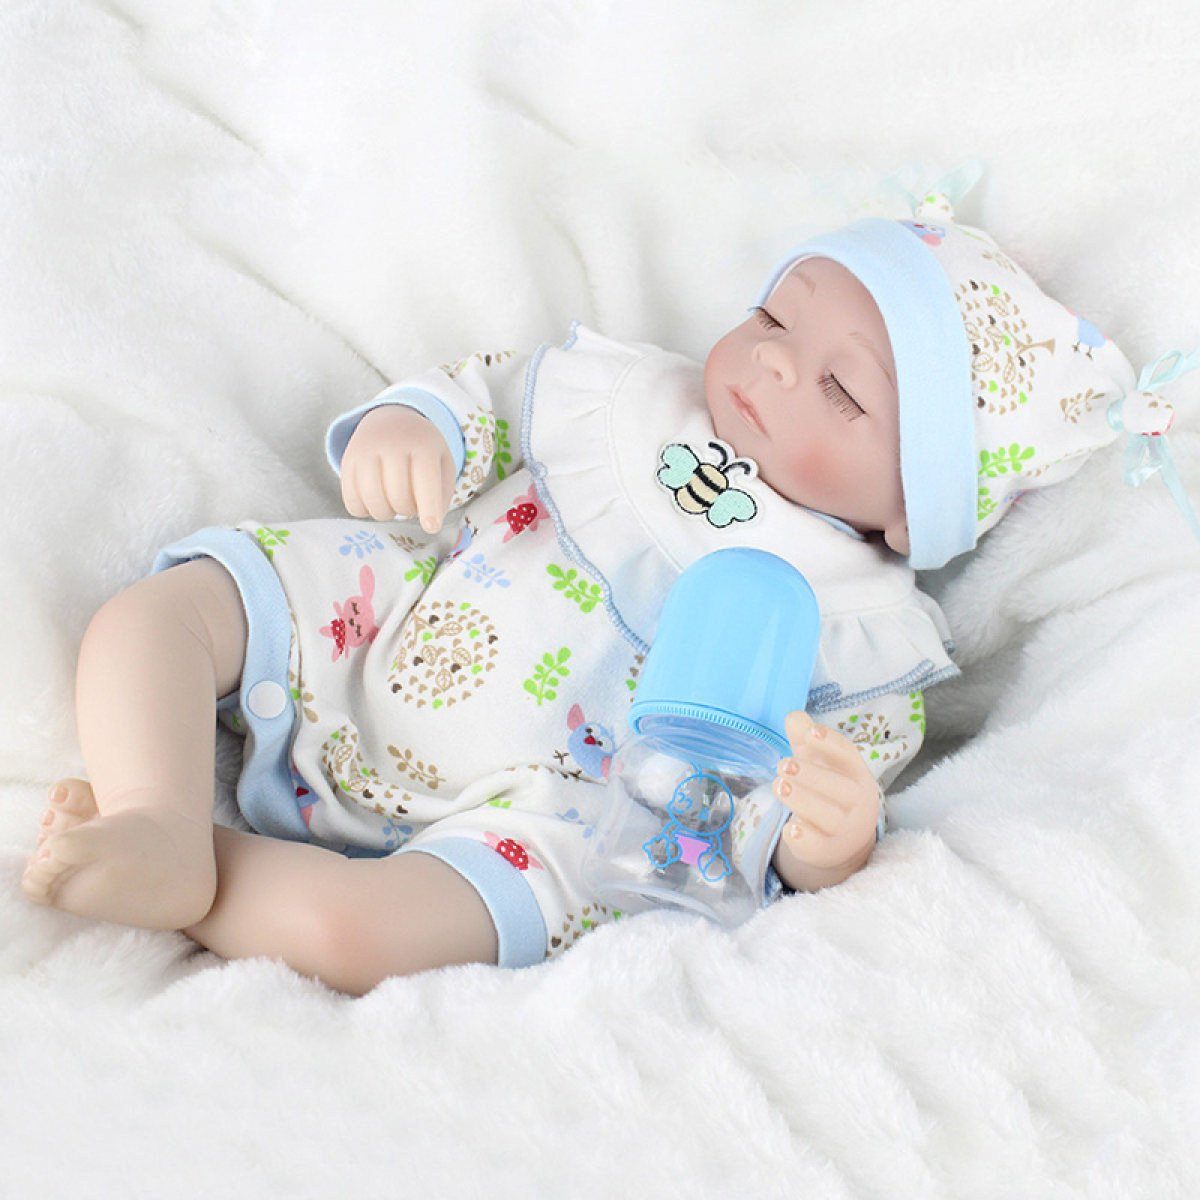 Yihang Rebornボディシリコンビニール人形Sleeping Boy Babies 18インチ45 cm磁気口フルAlive Baby Realビニールベリーキッズおもちゃ子供誕生日   B07BTY87QX